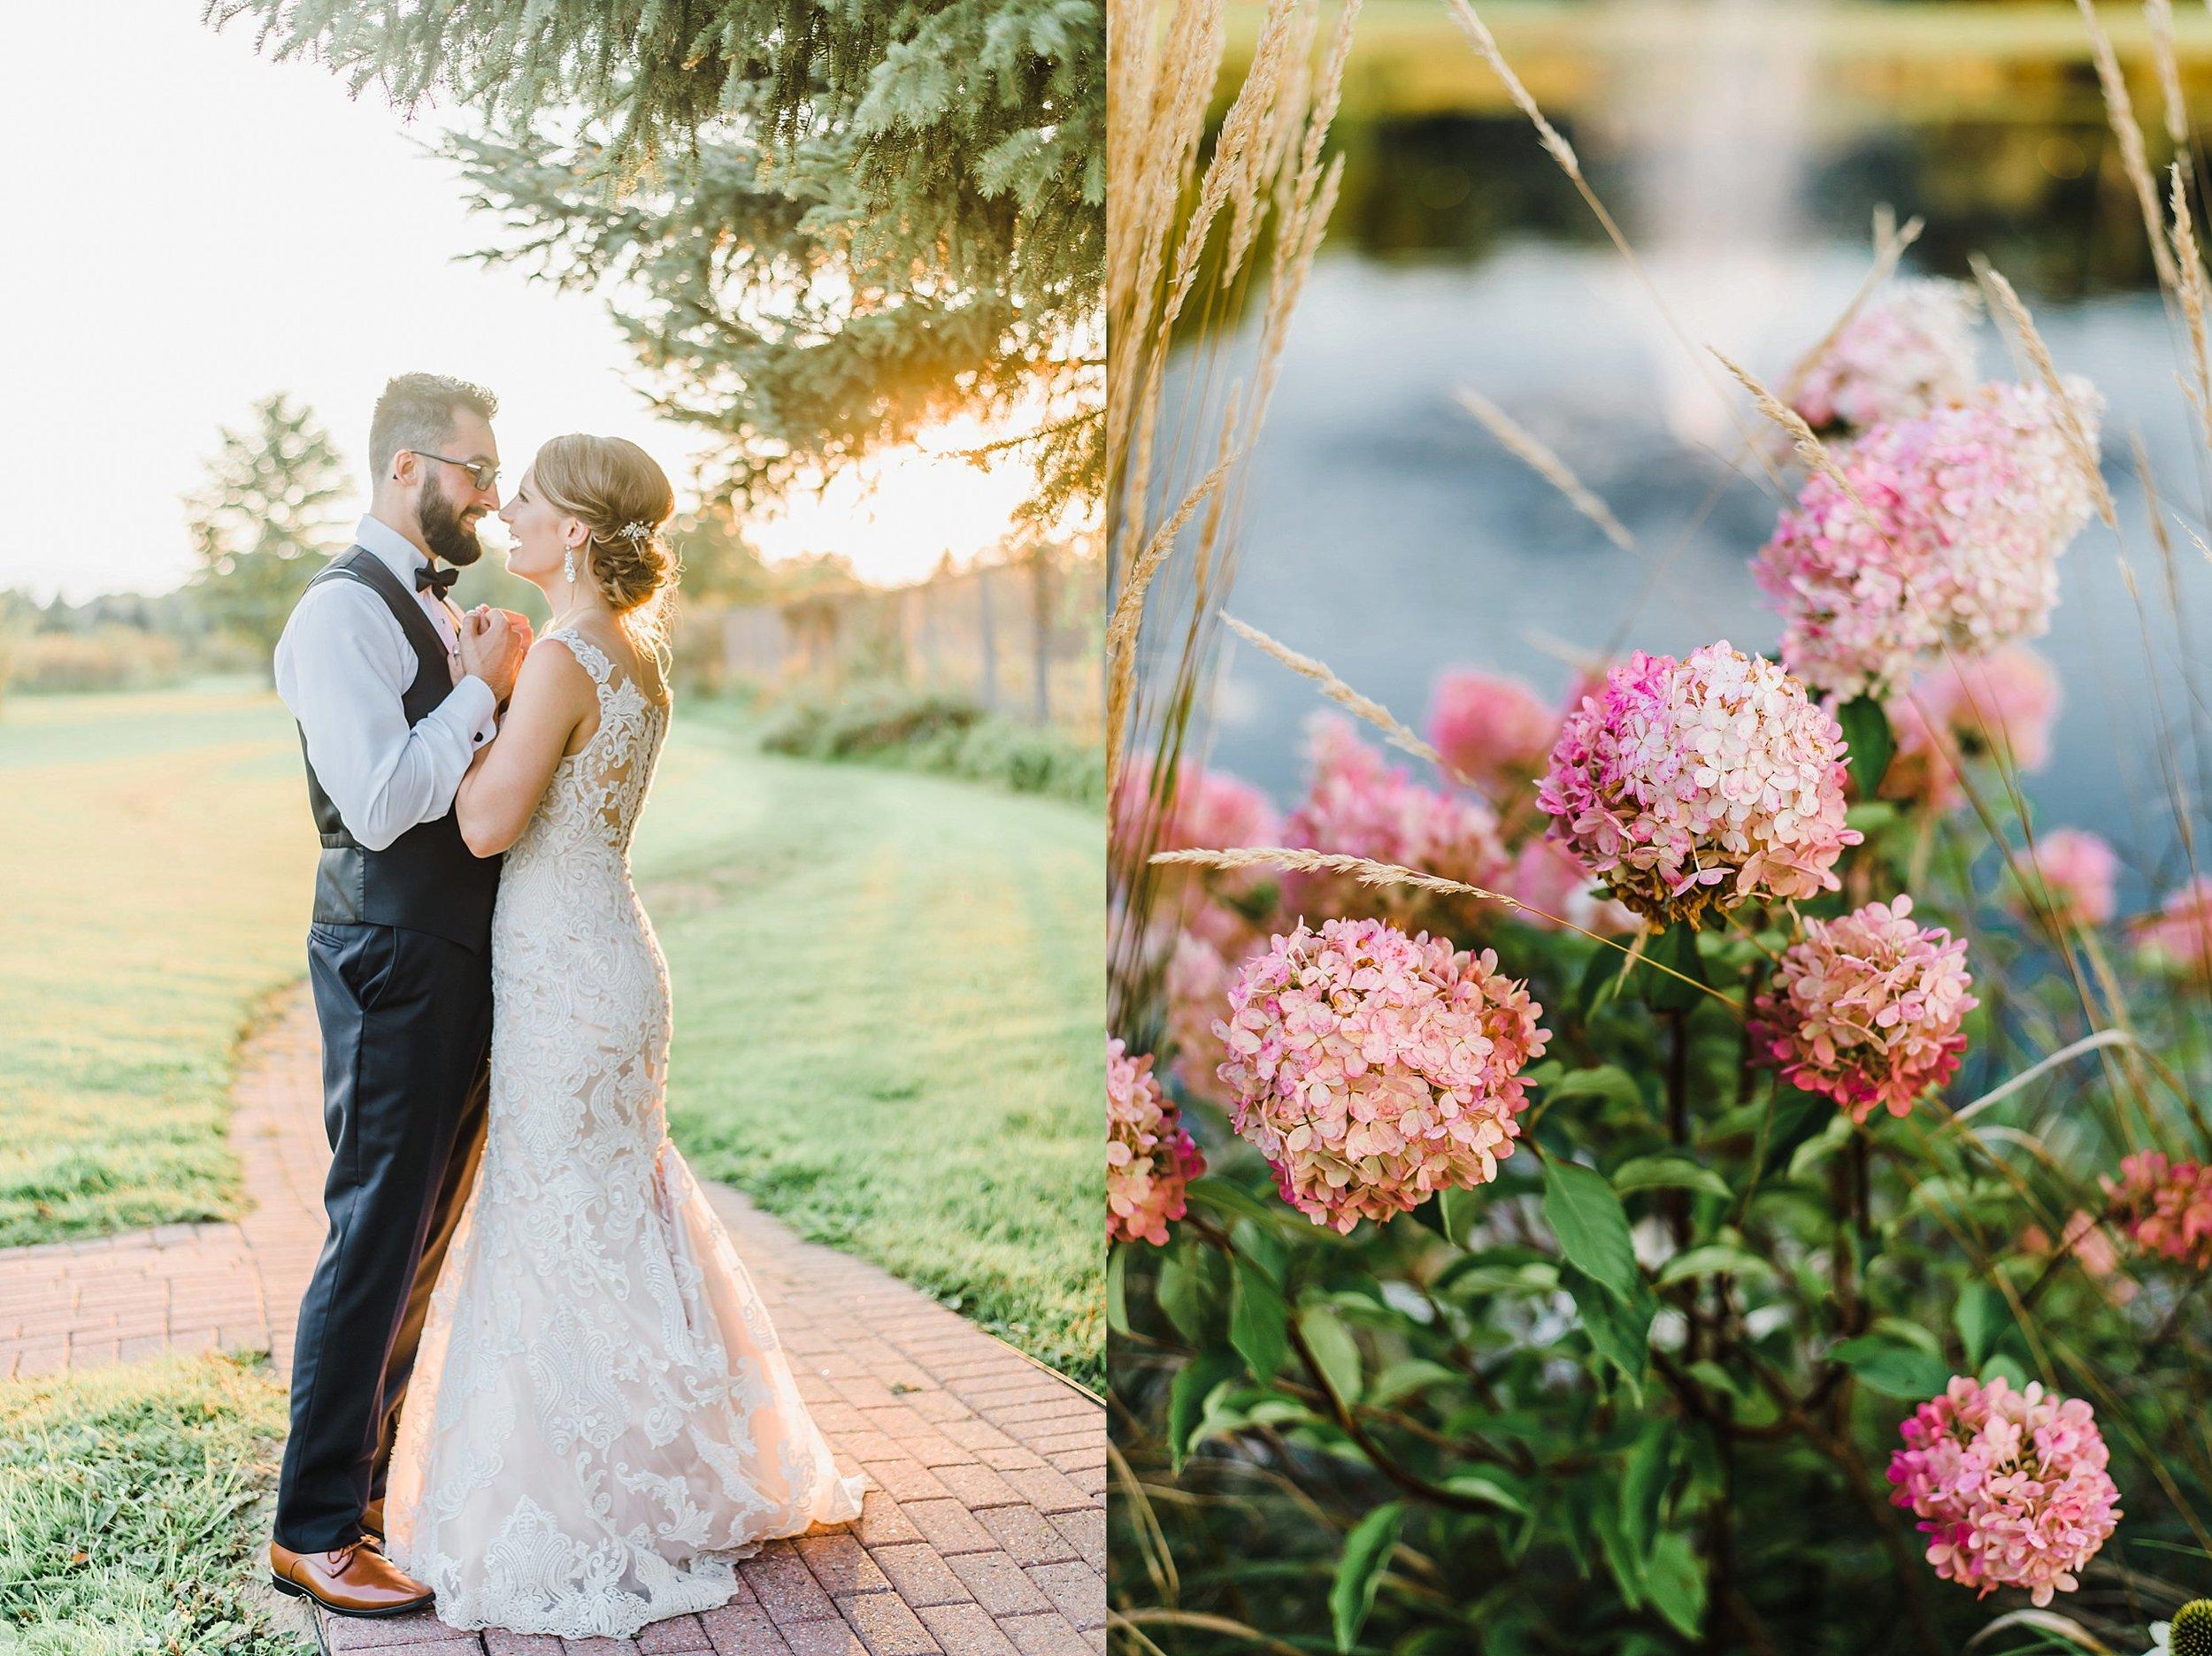 light airy indie fine art ottawa wedding photographer | Ali and Batoul Photography_1353.jpg